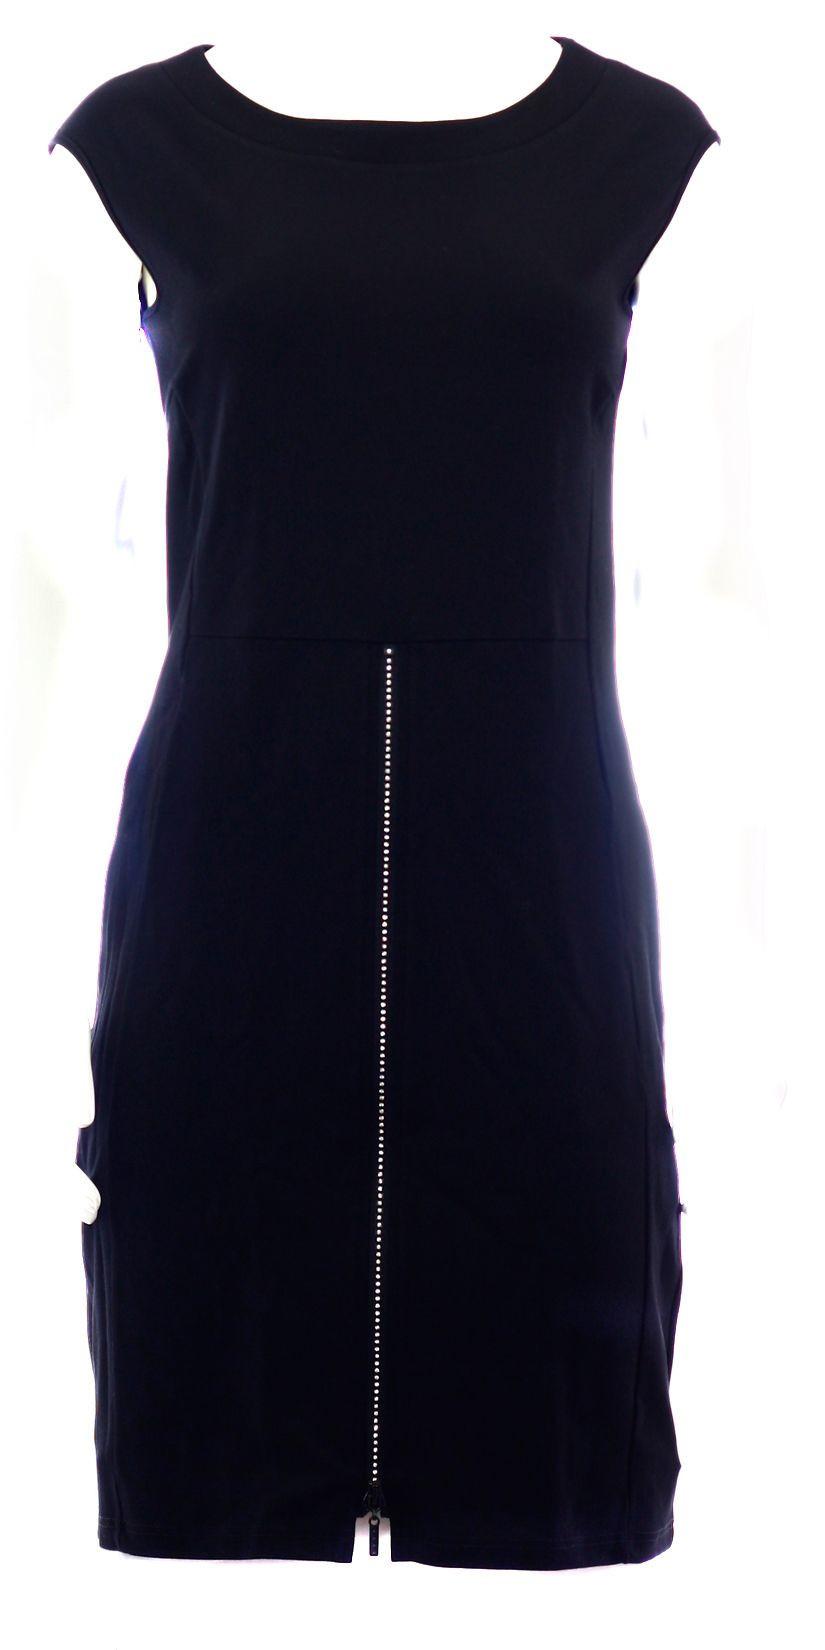 Šaty Kalemia - Favab Barva: smetanová, Velikost: L